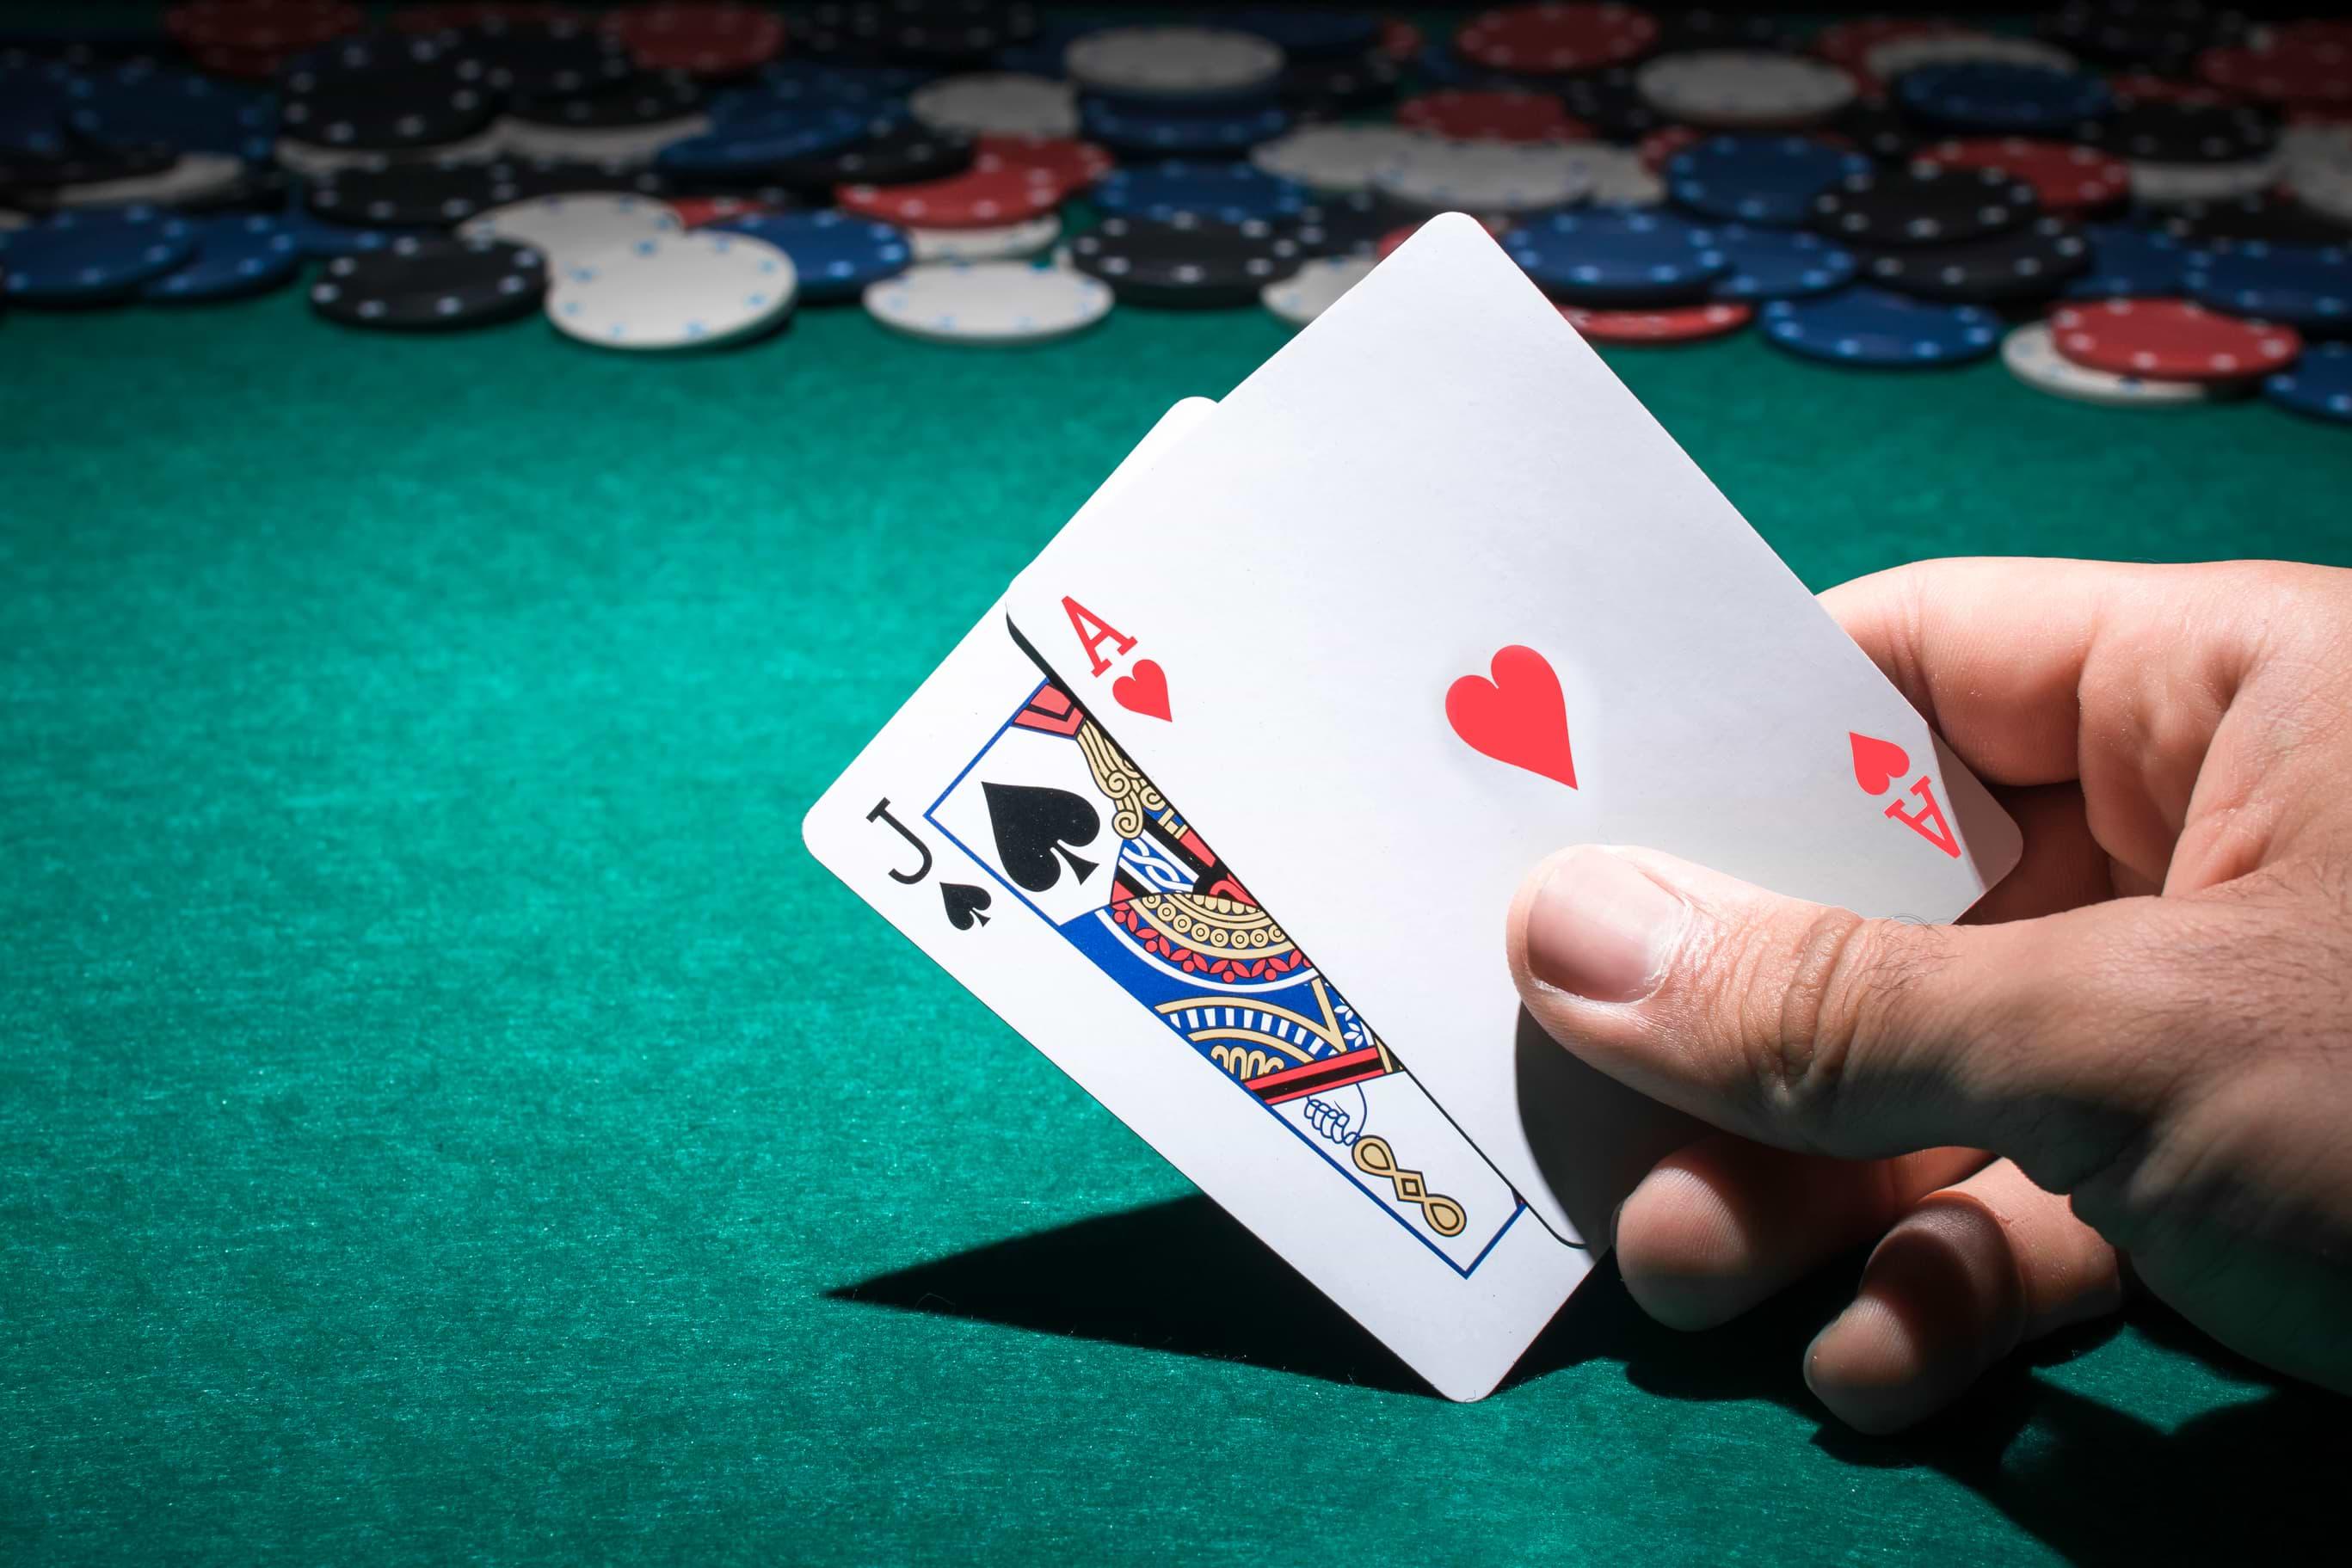 How To Play Multihand Blackjack